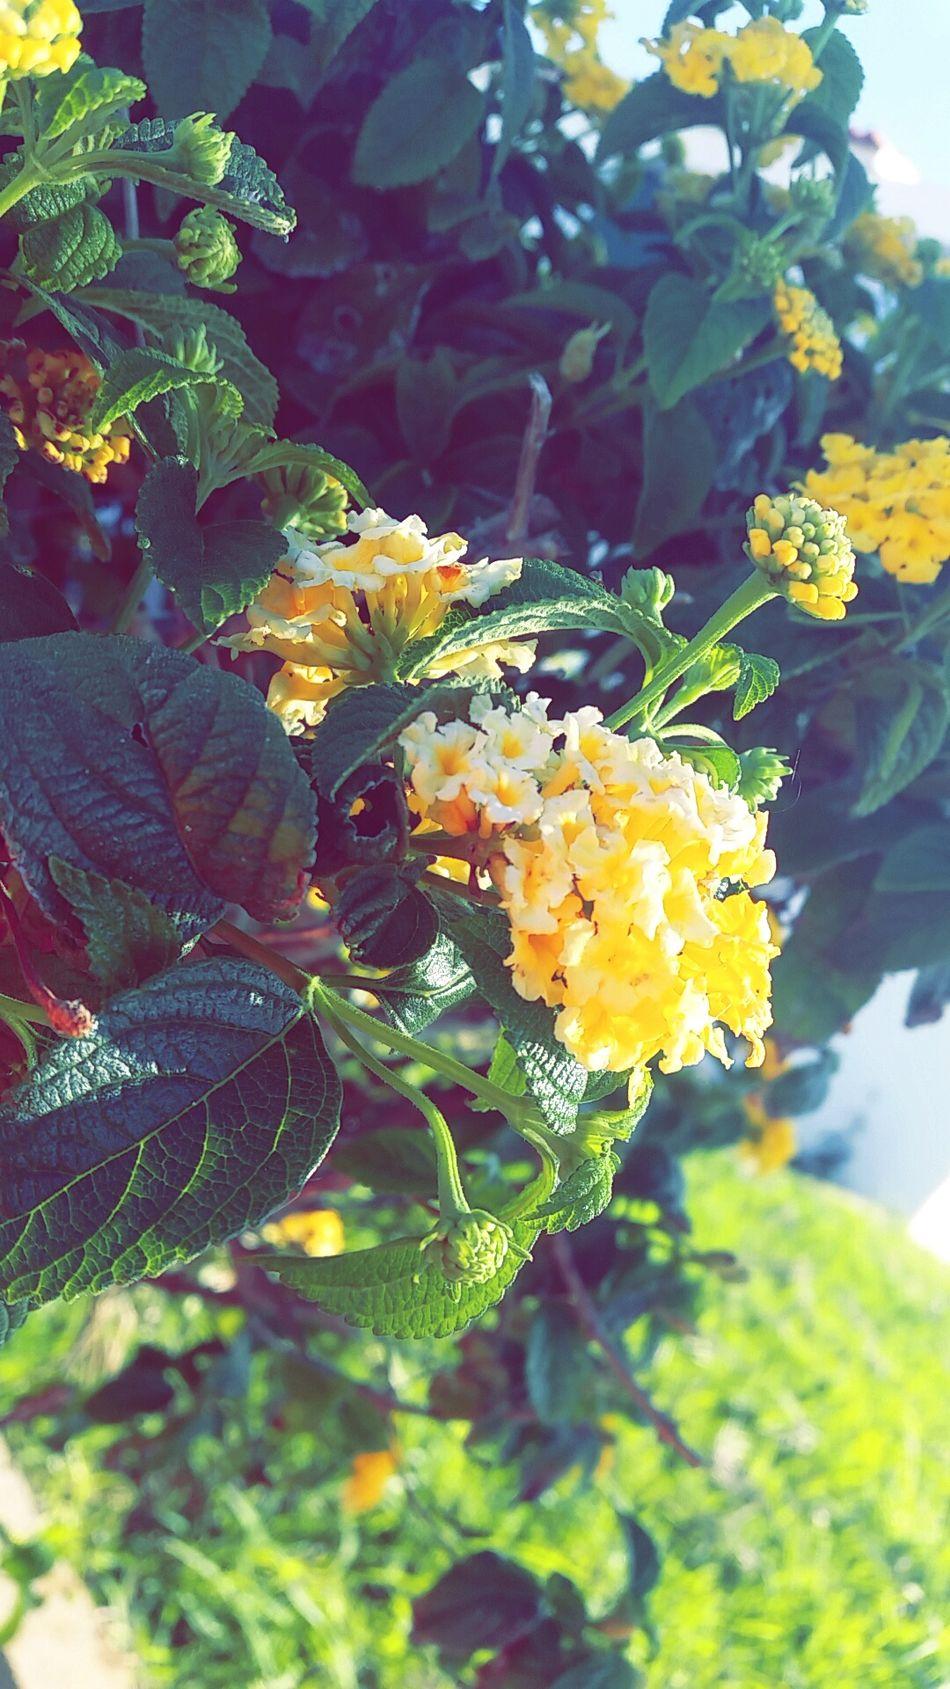 Wellow Flowerlovers Flowers_collection Flowers,Plants & Garden Colors Green Color Green